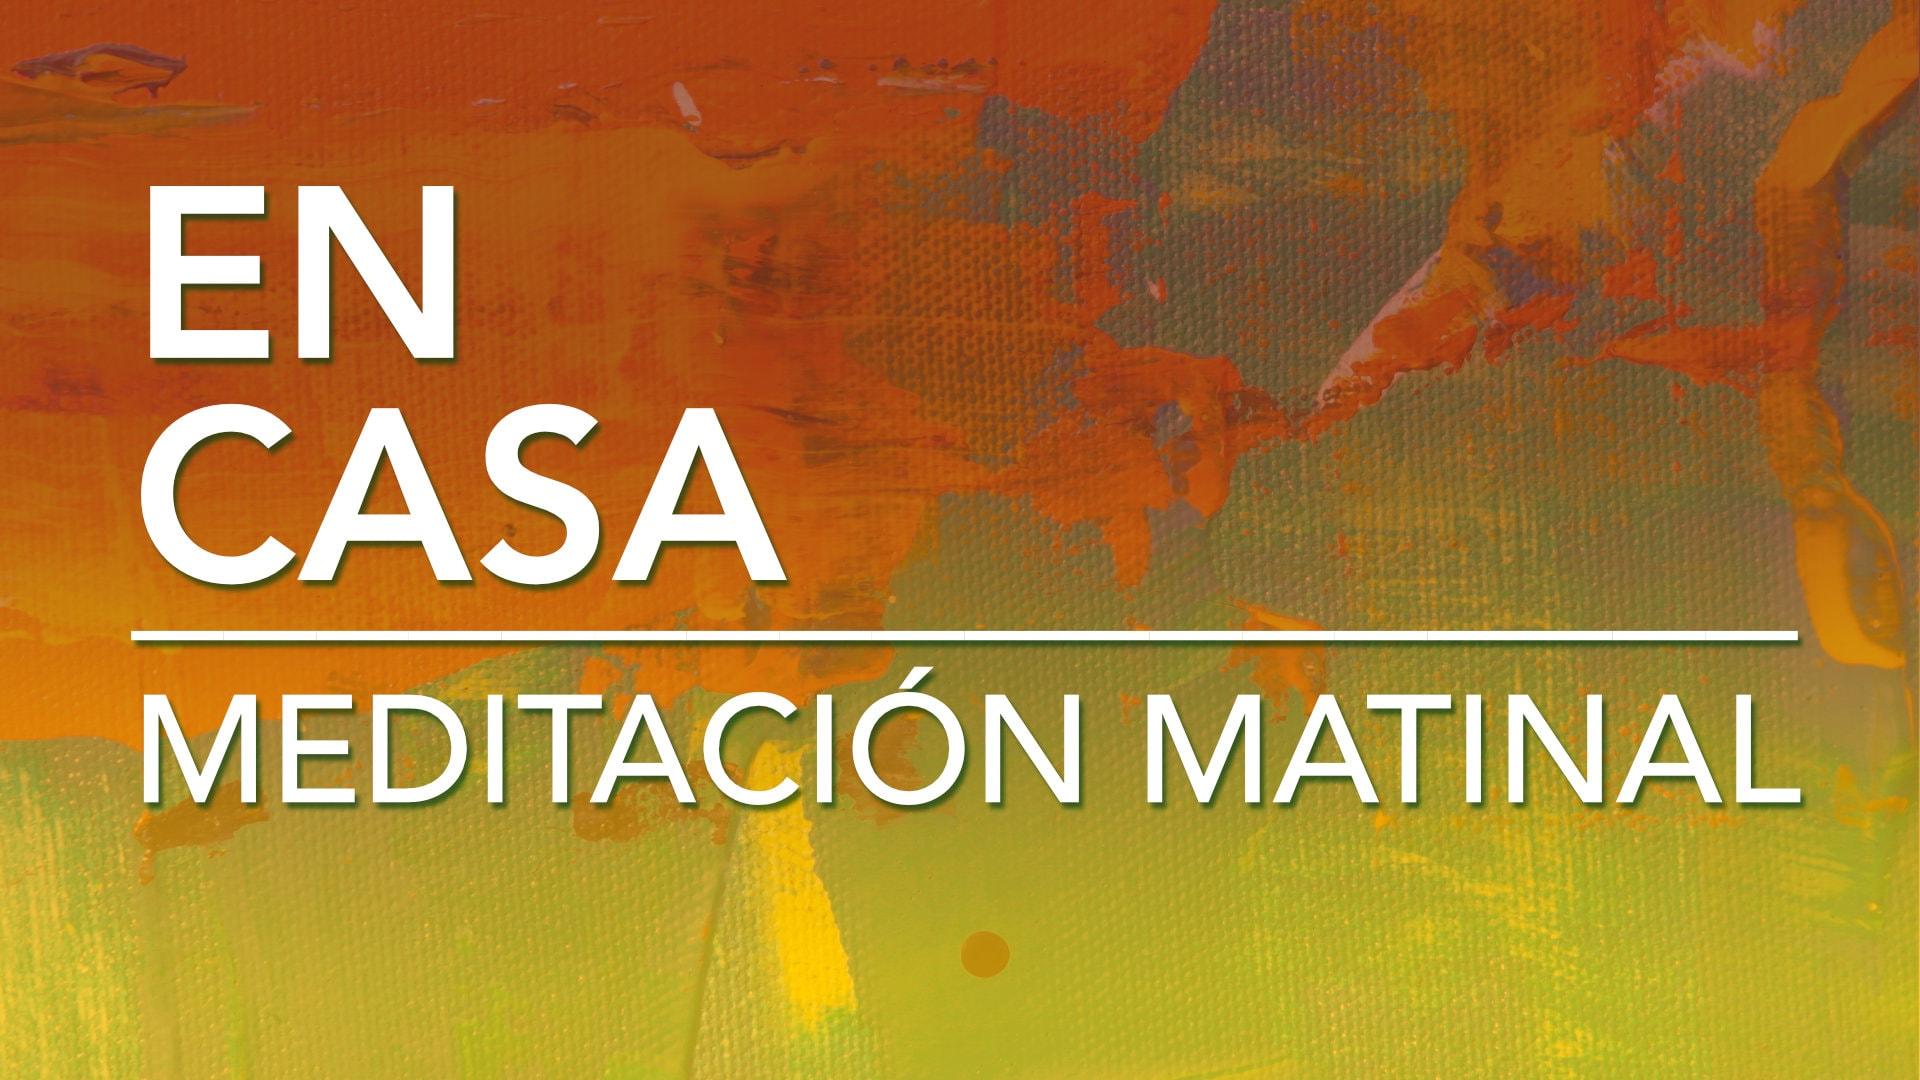 image from EN CASA